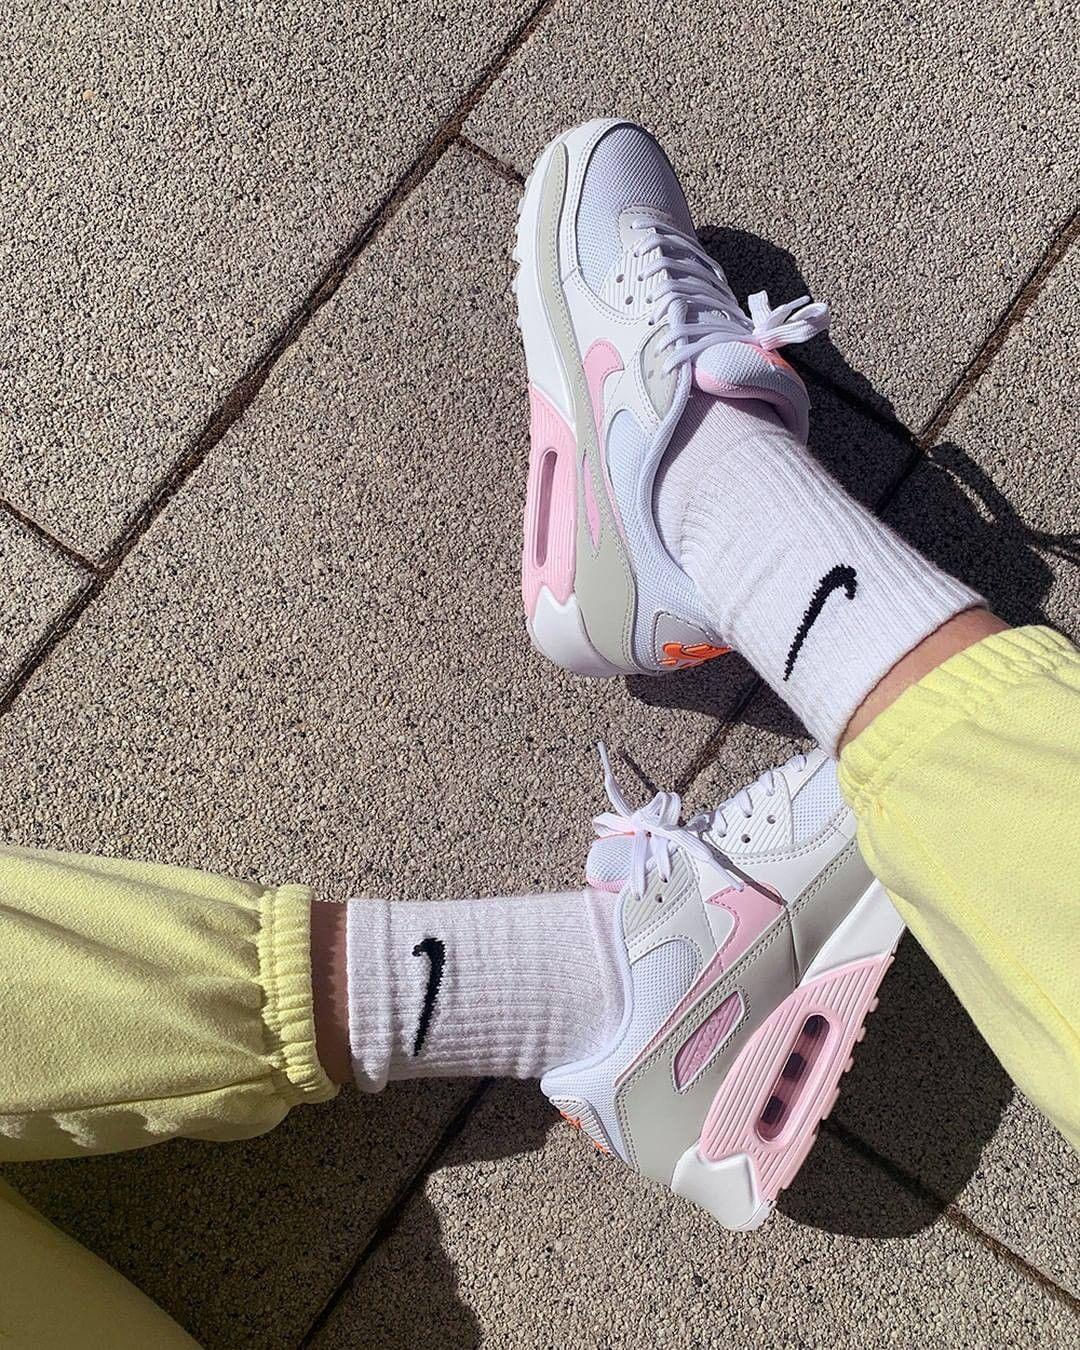 Nike Air Max. Instagram @jdsportssg